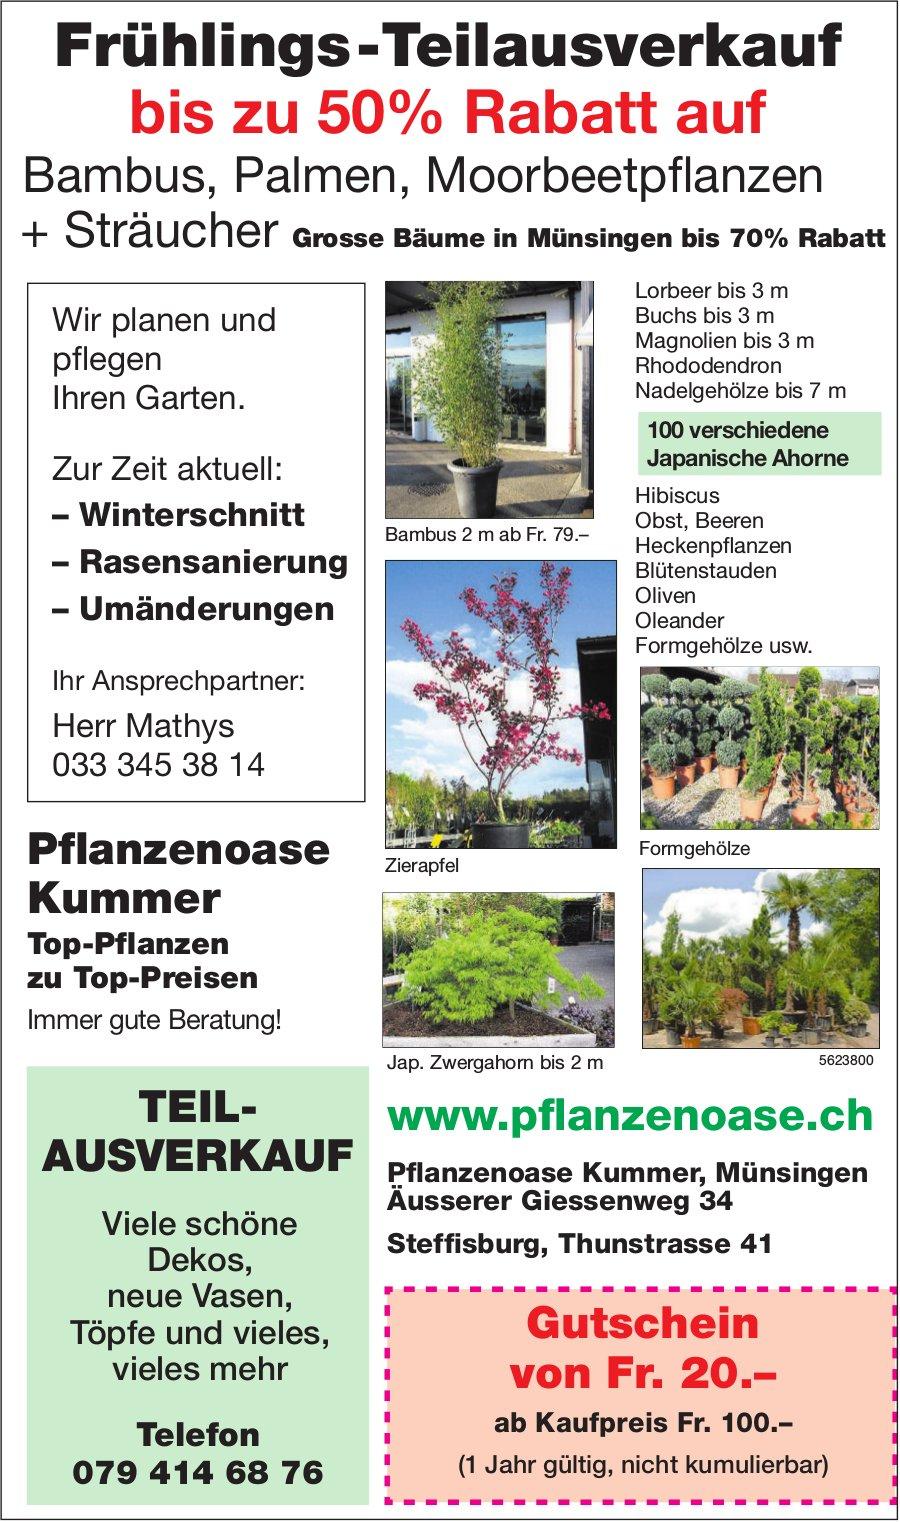 Pflanzenoase Kummer - Frühlings-Teilausverkauf bis zu 50% Rabatt